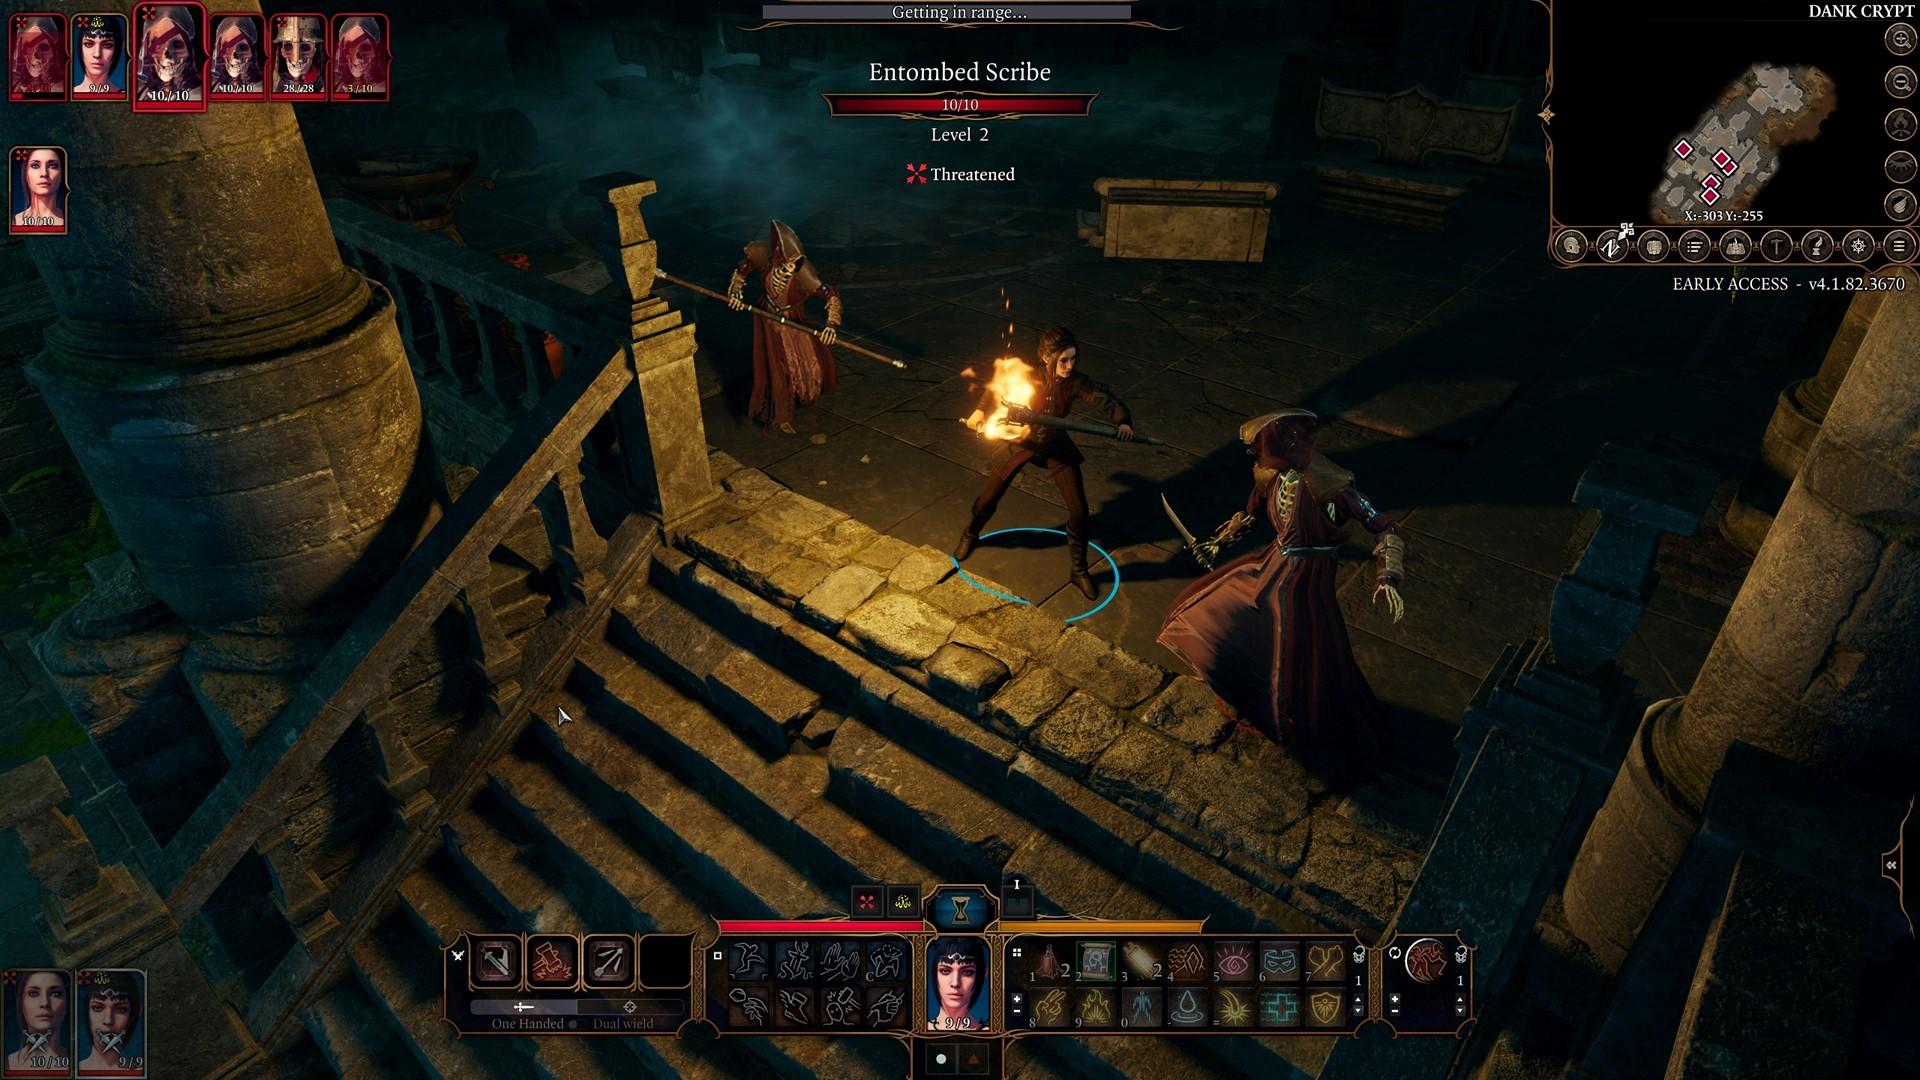 Combat-Undead-Tomb-Fight